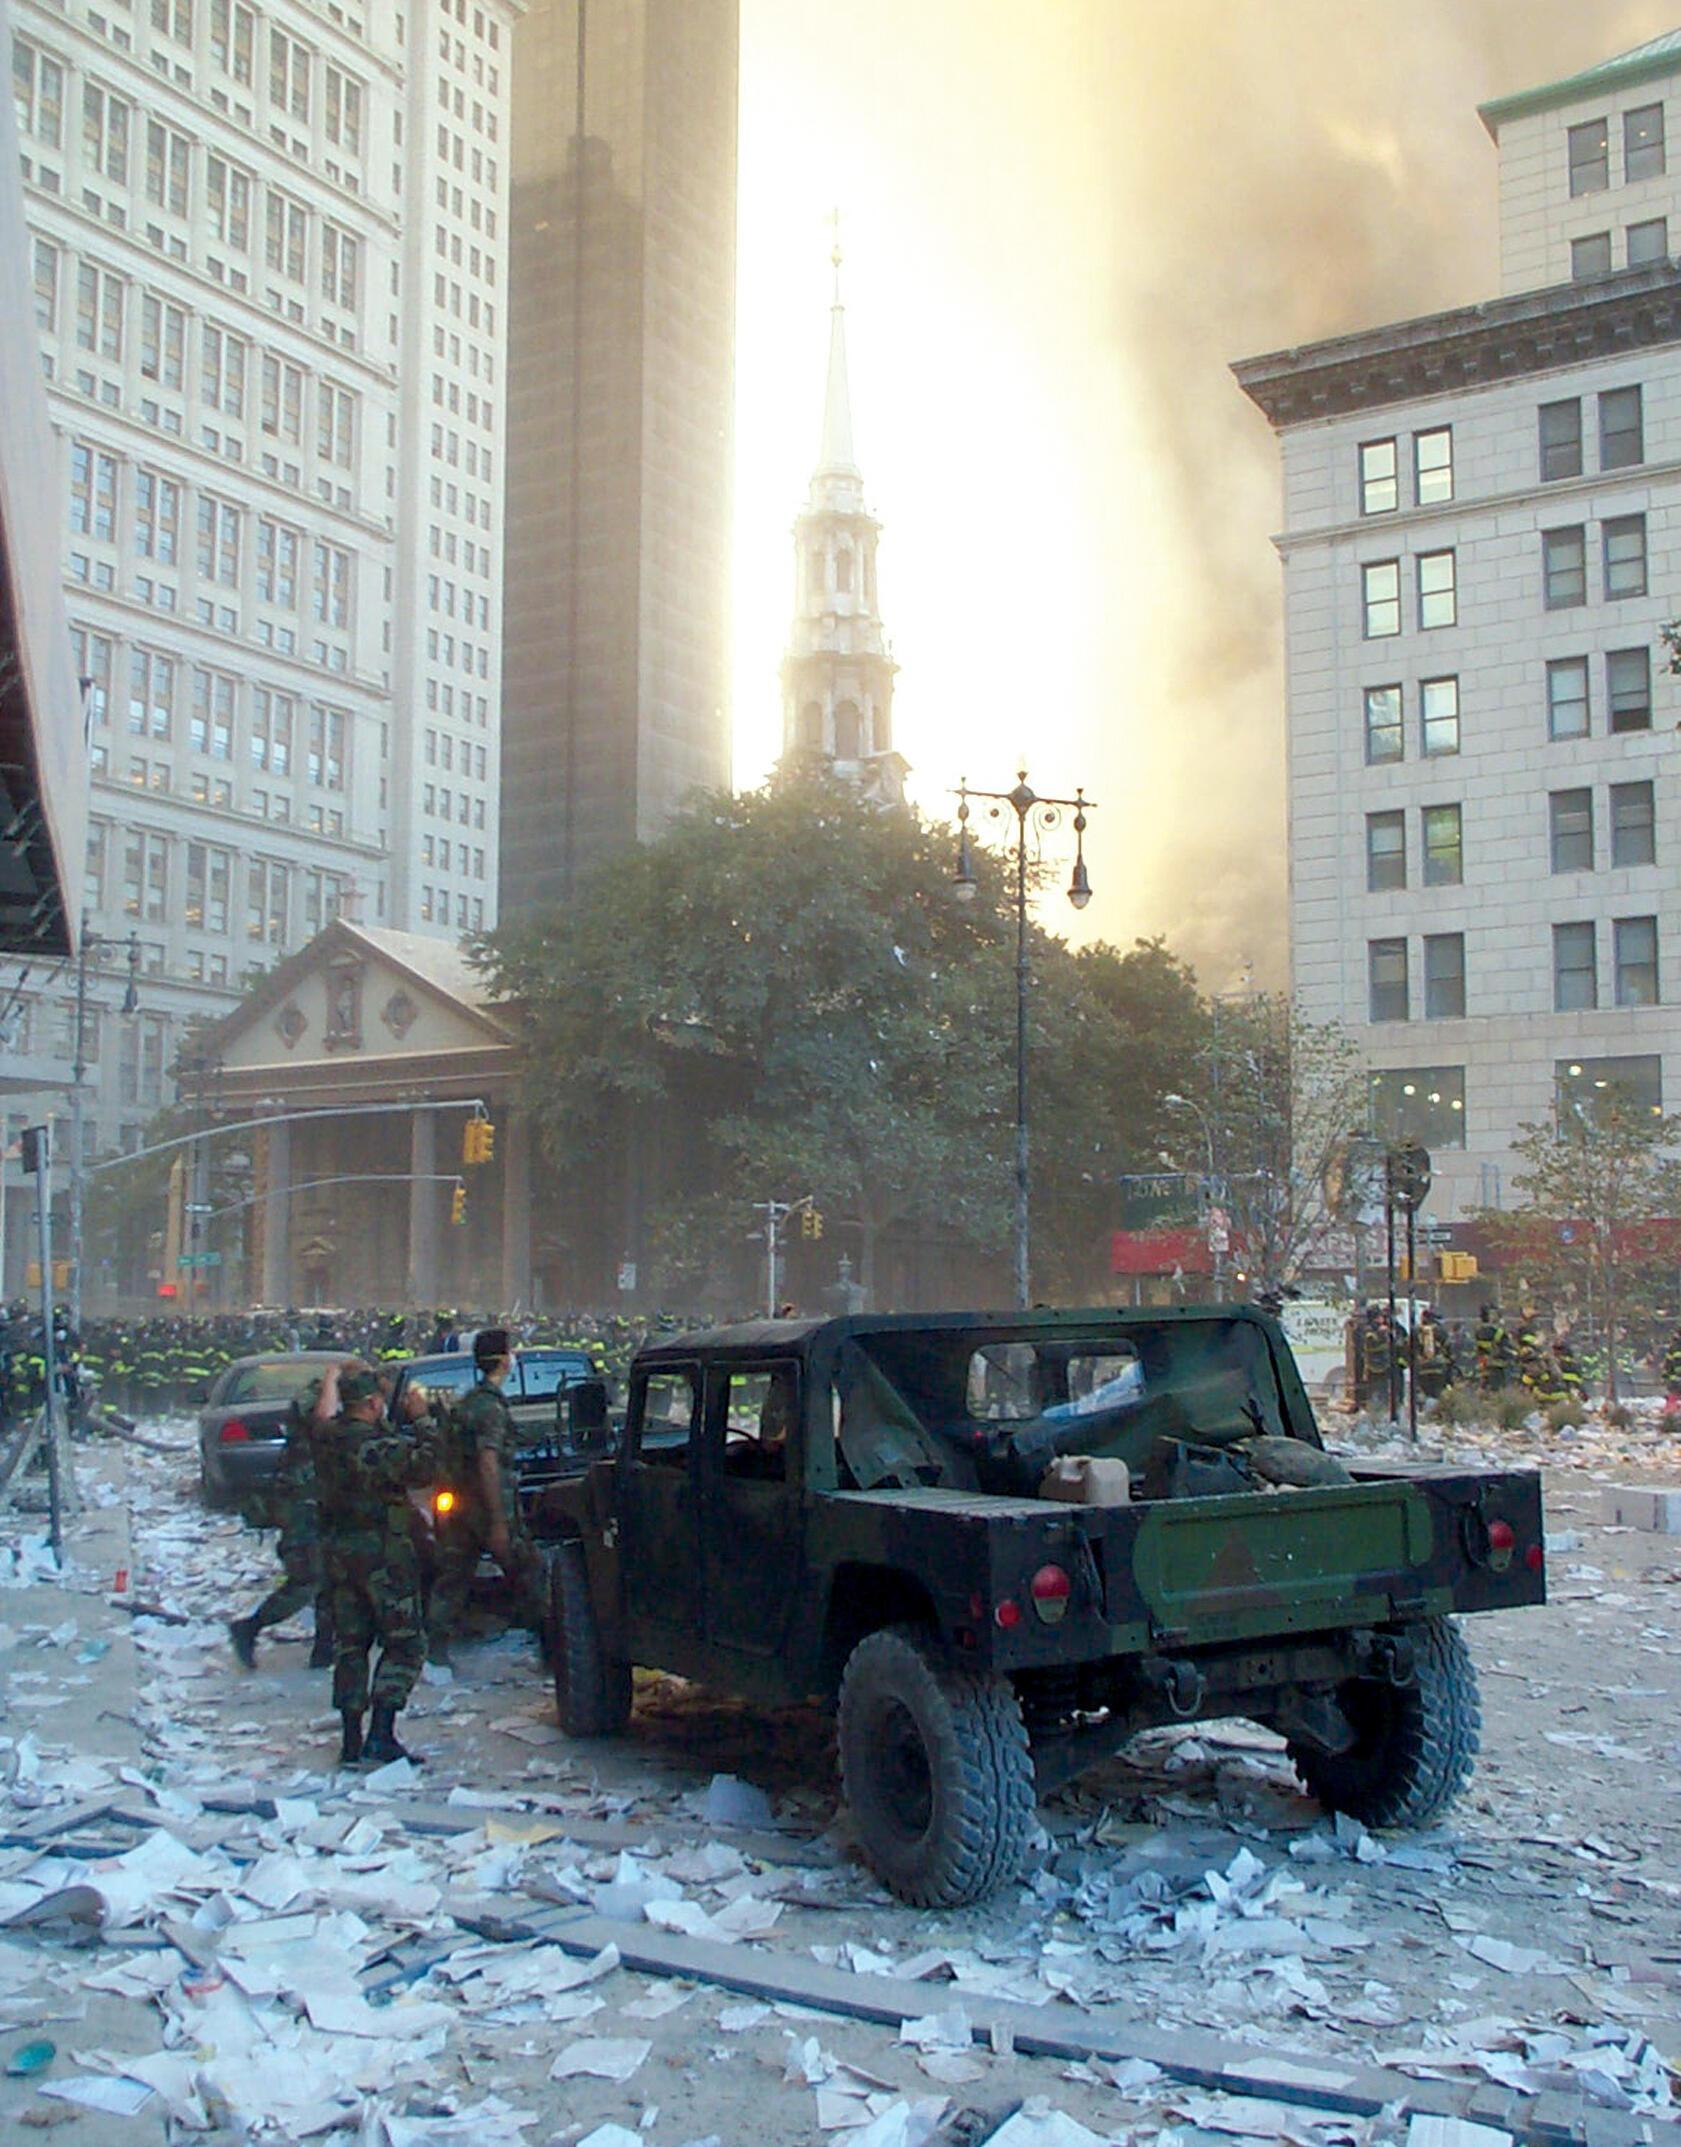 Military at St. Paul's Chapel on September 11, 2001.